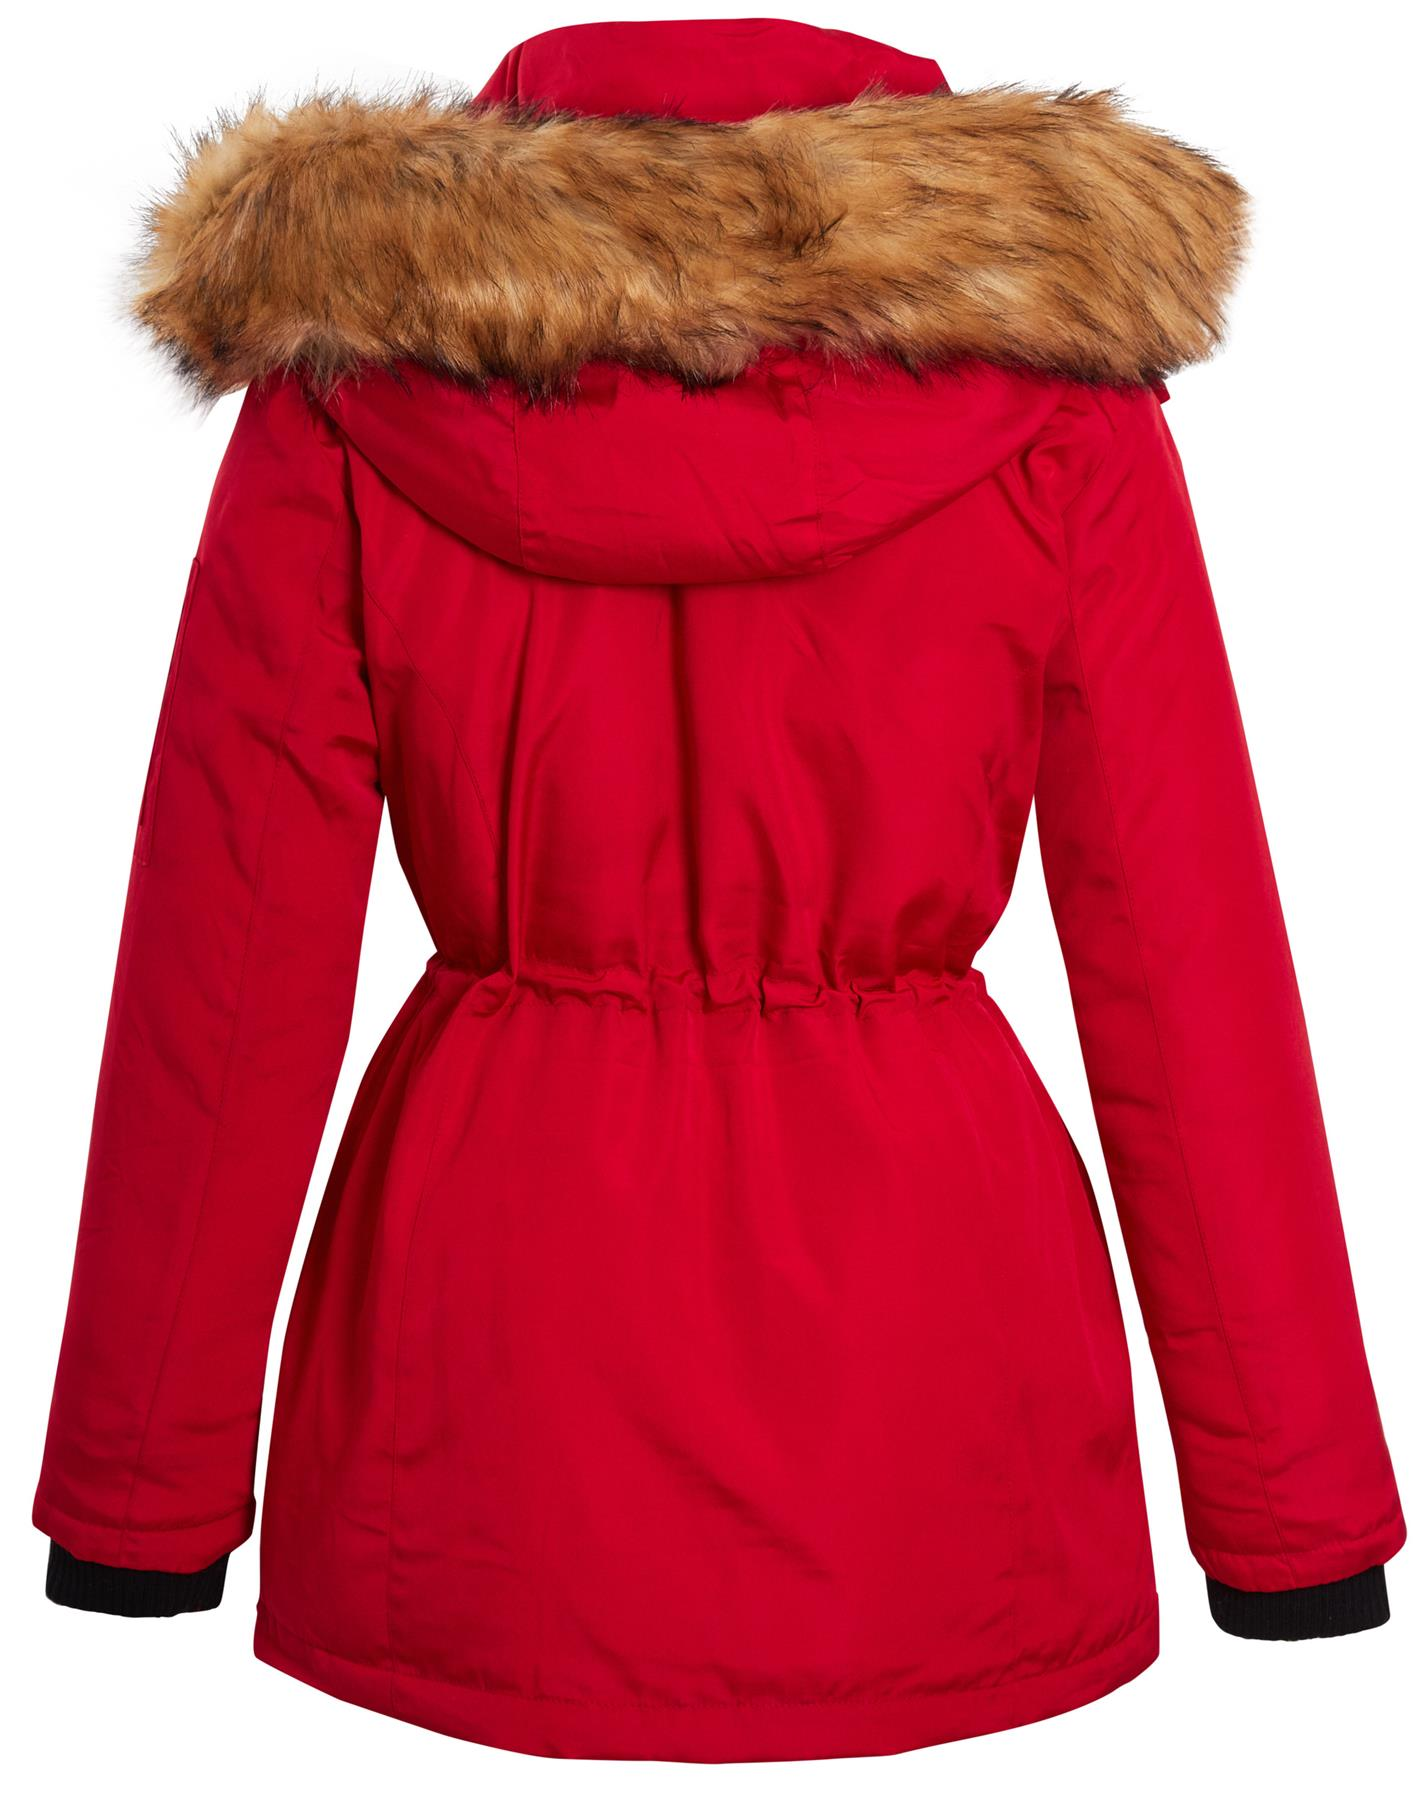 Ladies Ski Longline Jacket Padded Parka Faux Fur Hood Hooded Coat Size